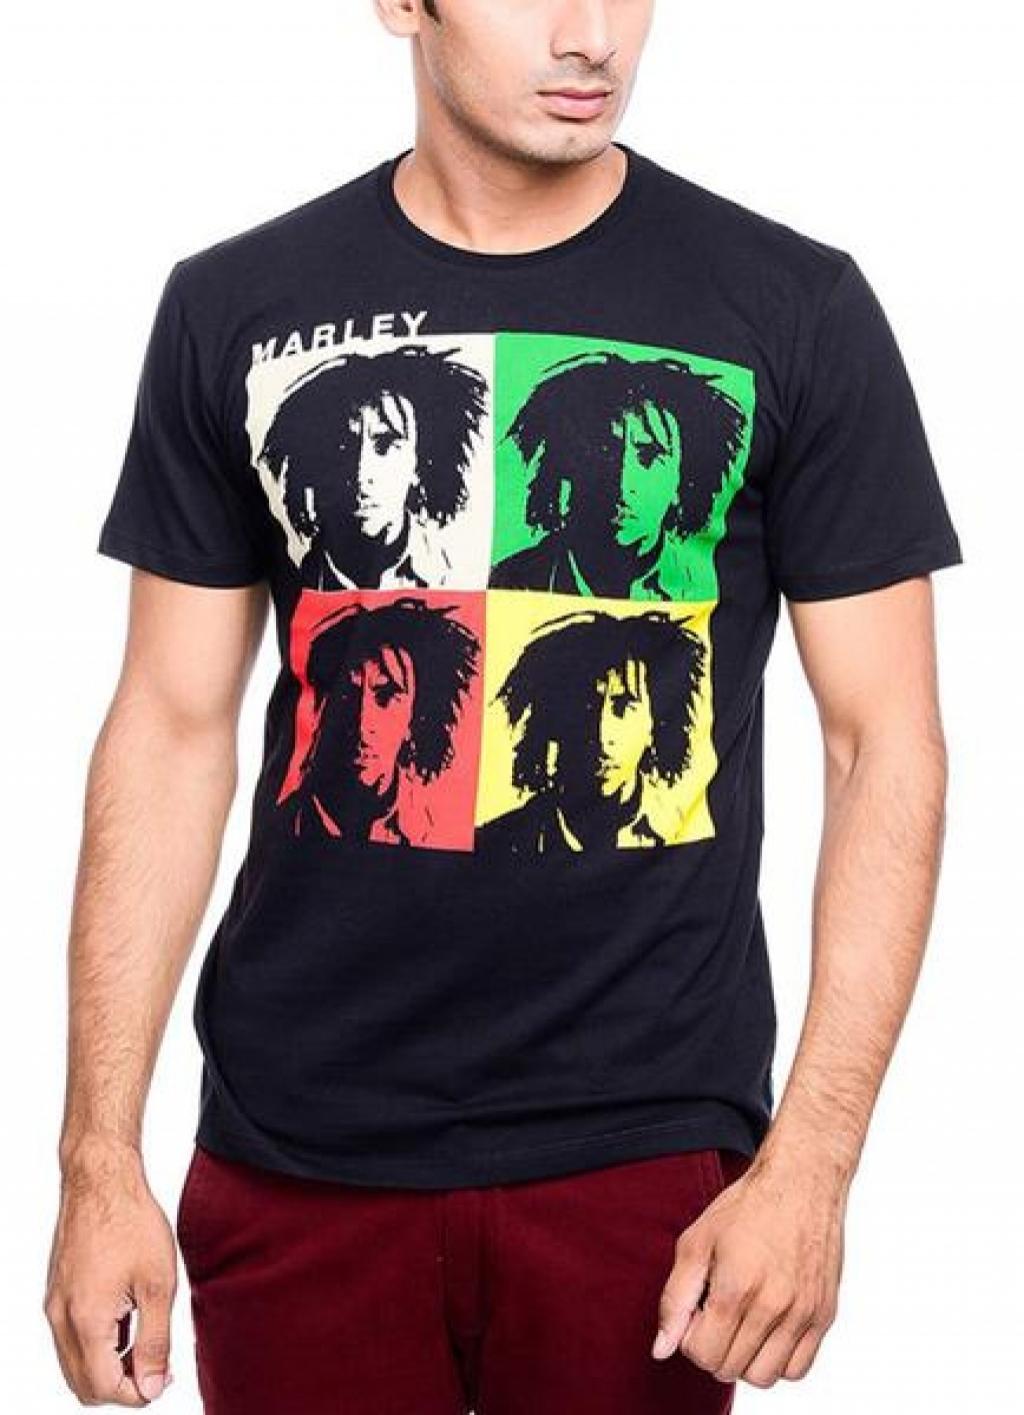 14966628290_Bob_Marley_Amplified_Depth_Black_Half_Sleeve_Men_T-Shirt_Black.jpg